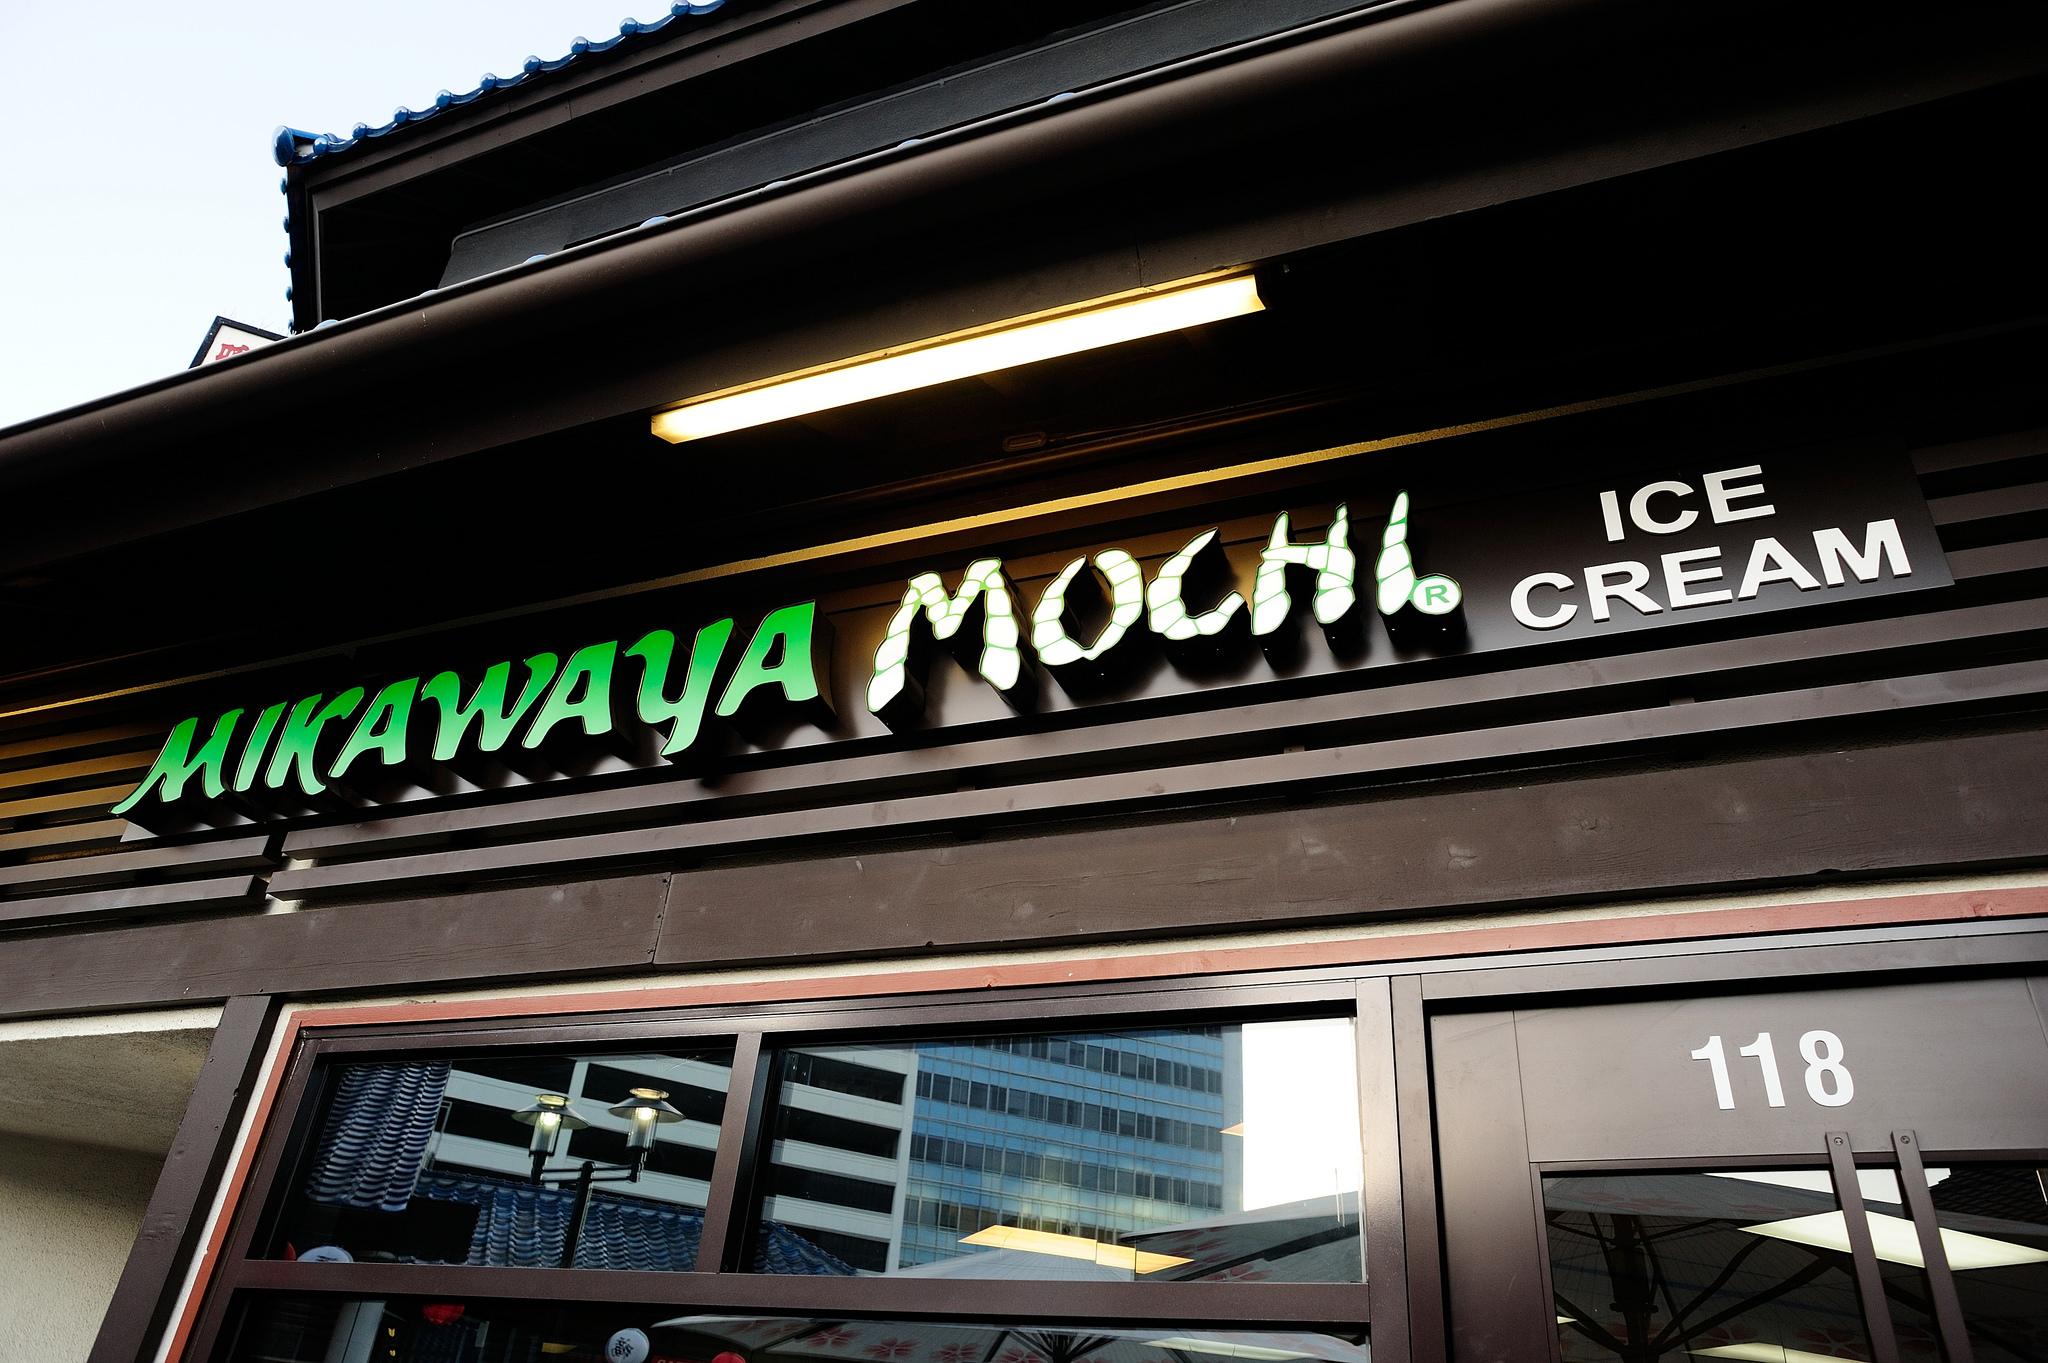 Mikawaya Mochi ©SMichael Saechang/Flickr